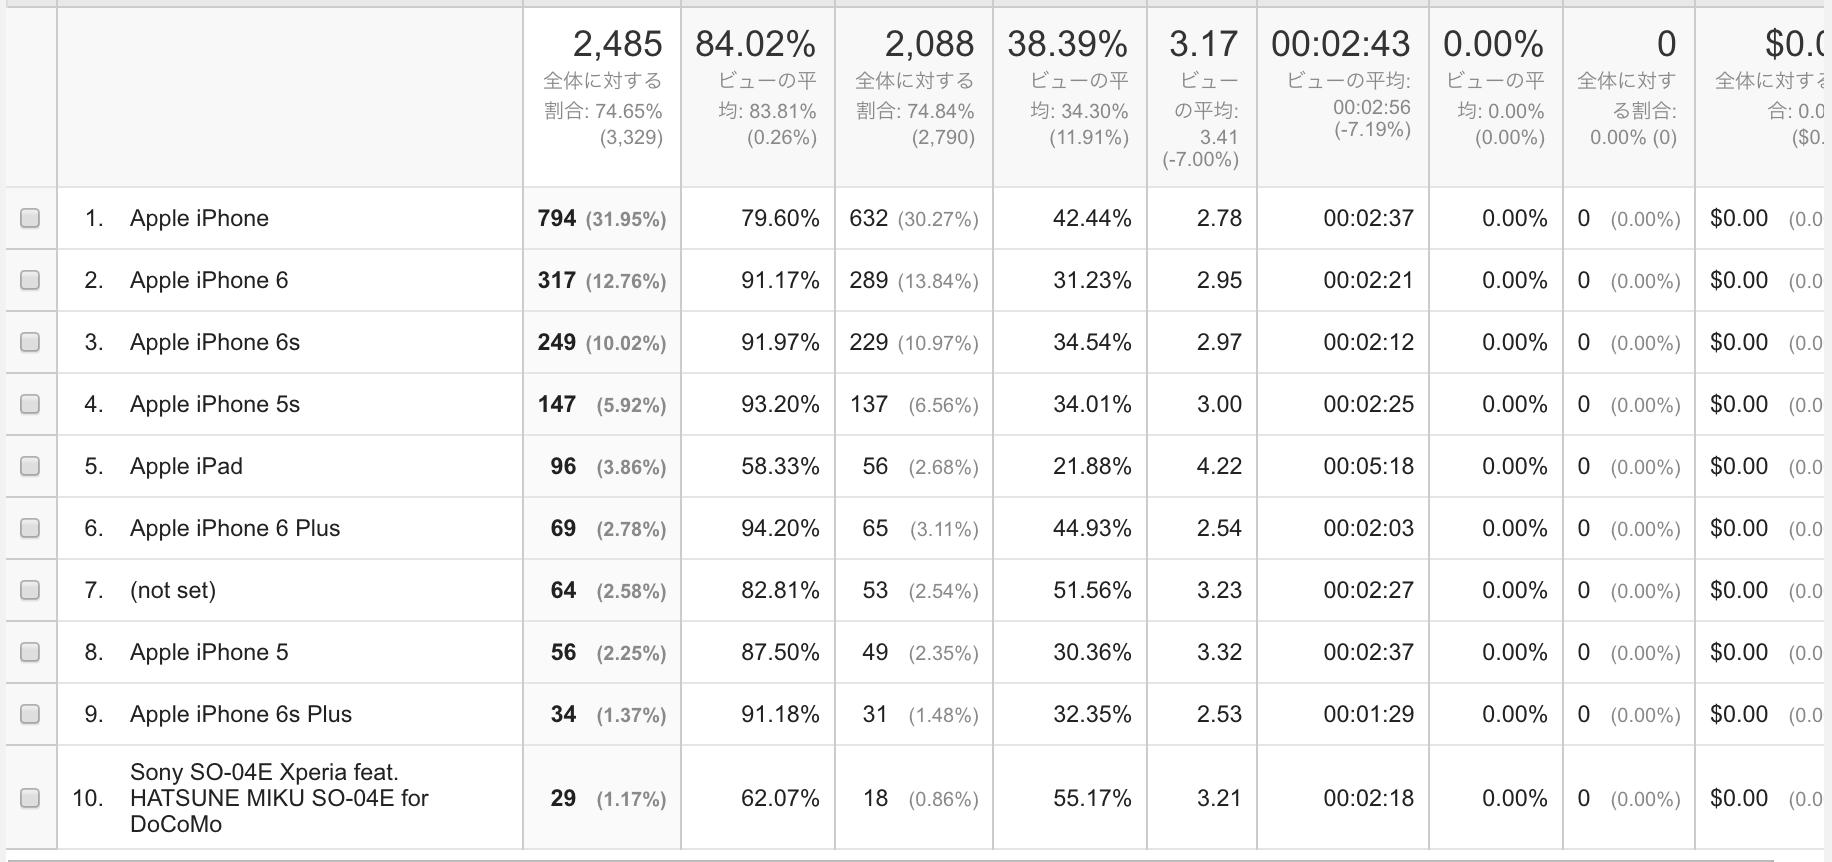 %e3%82%b9%e3%82%af%e3%83%aa%e3%83%bc%e3%83%b3%e3%82%b7%e3%83%a7%e3%83%83%e3%83%88-2016-09-09-13-40-31